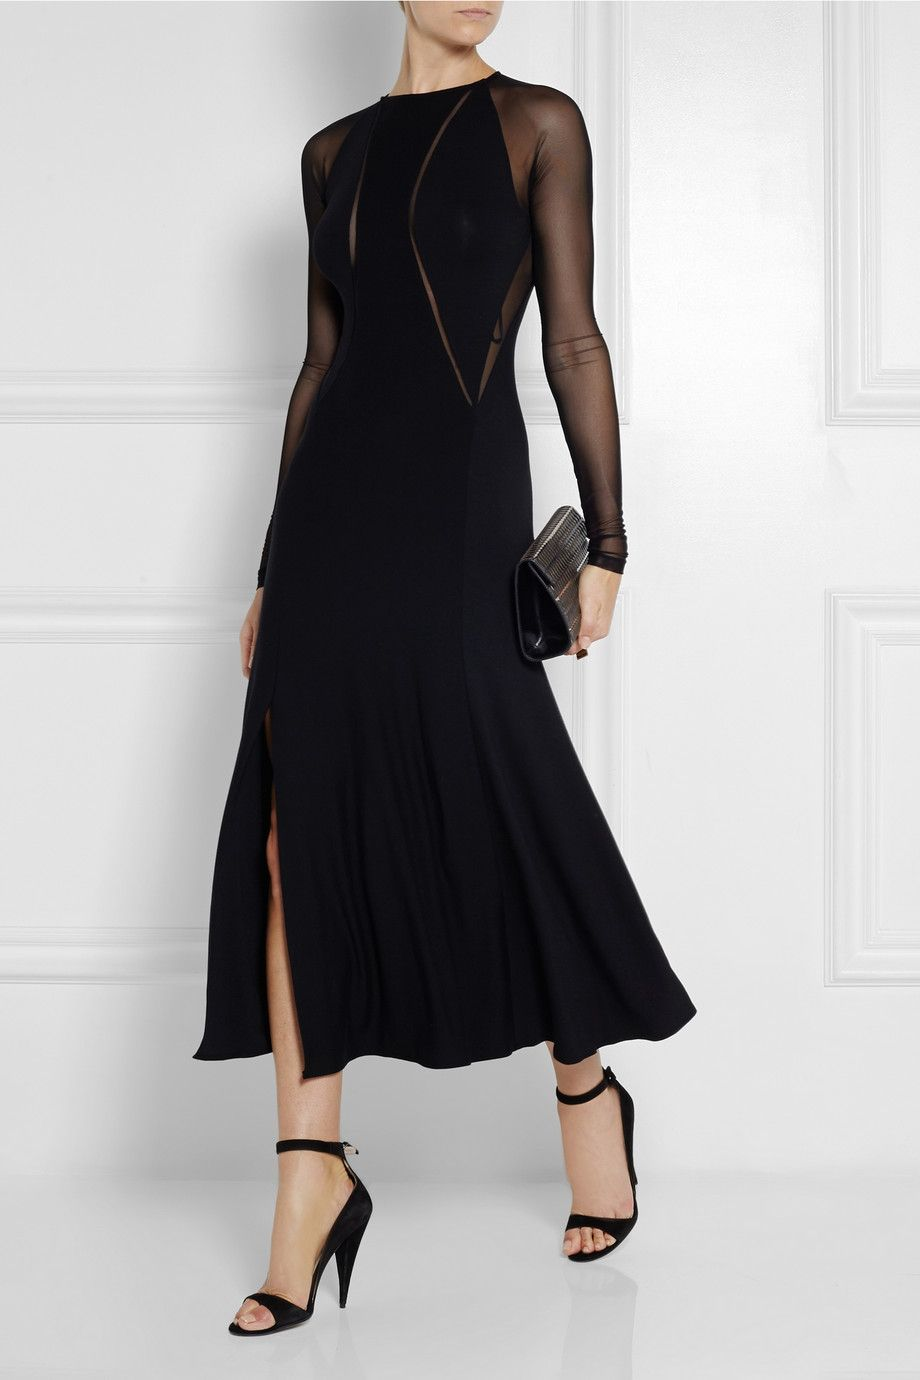 Donna karan meshpaneled stretchjersey maxi dress netaporter